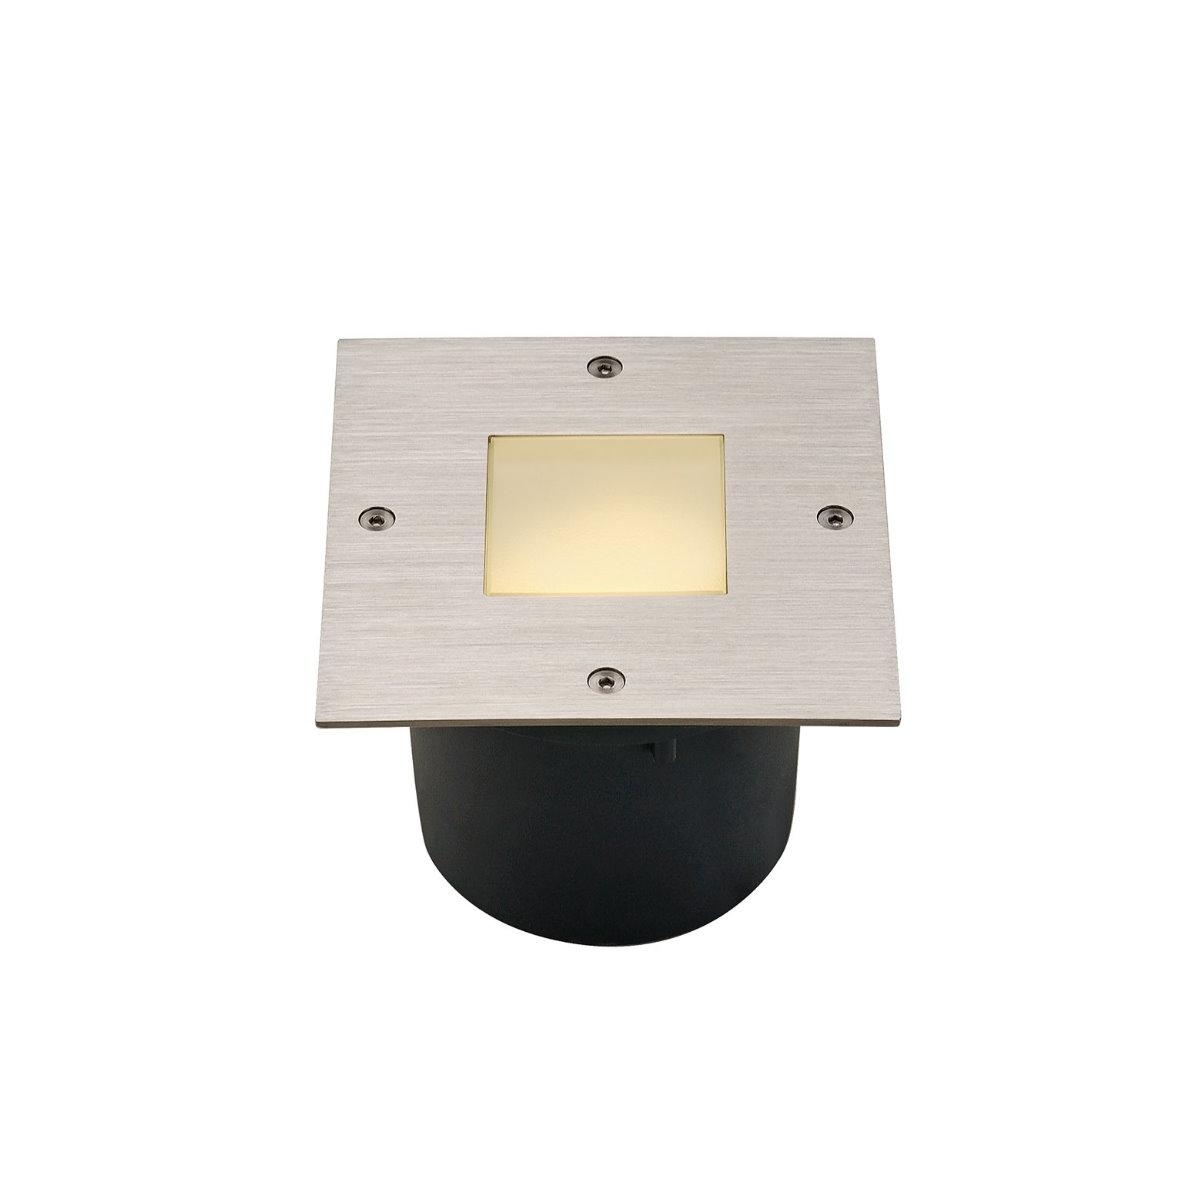 sol installation projecteur ext rieur installation sol projecteur sol encastr spot 230 v ebay. Black Bedroom Furniture Sets. Home Design Ideas